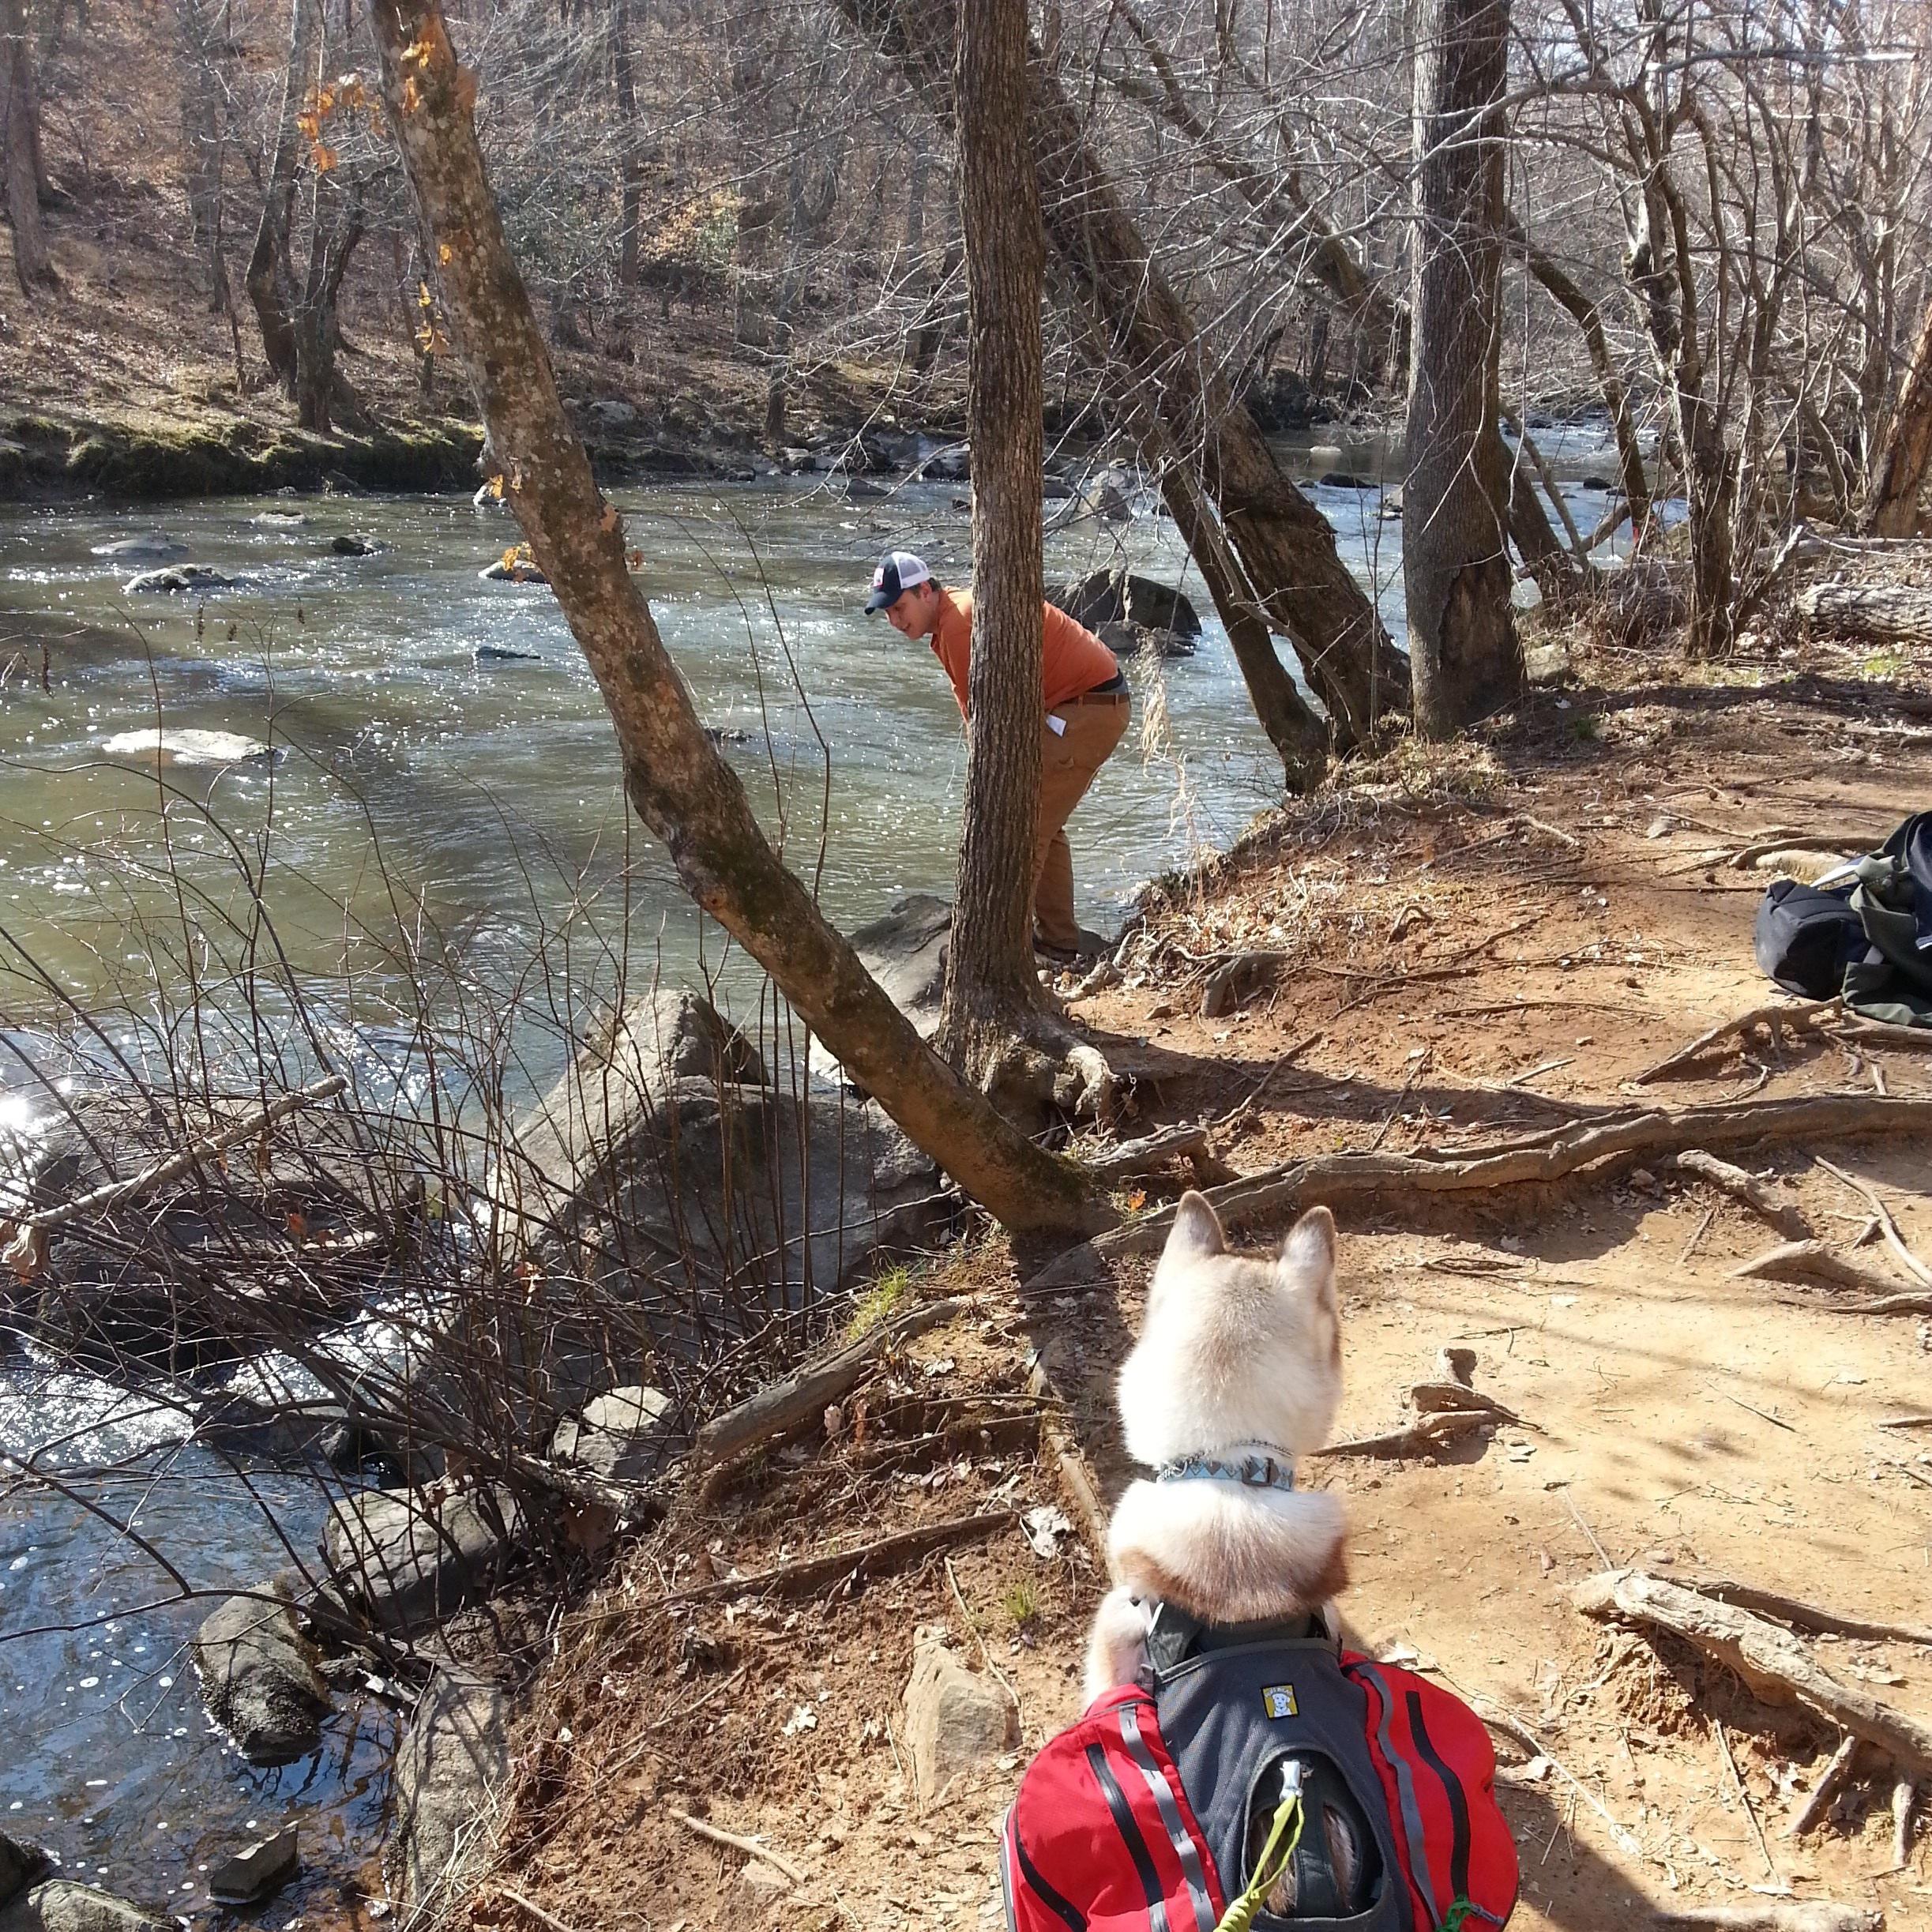 Surveying the banks at Buckquarter Creek Trail